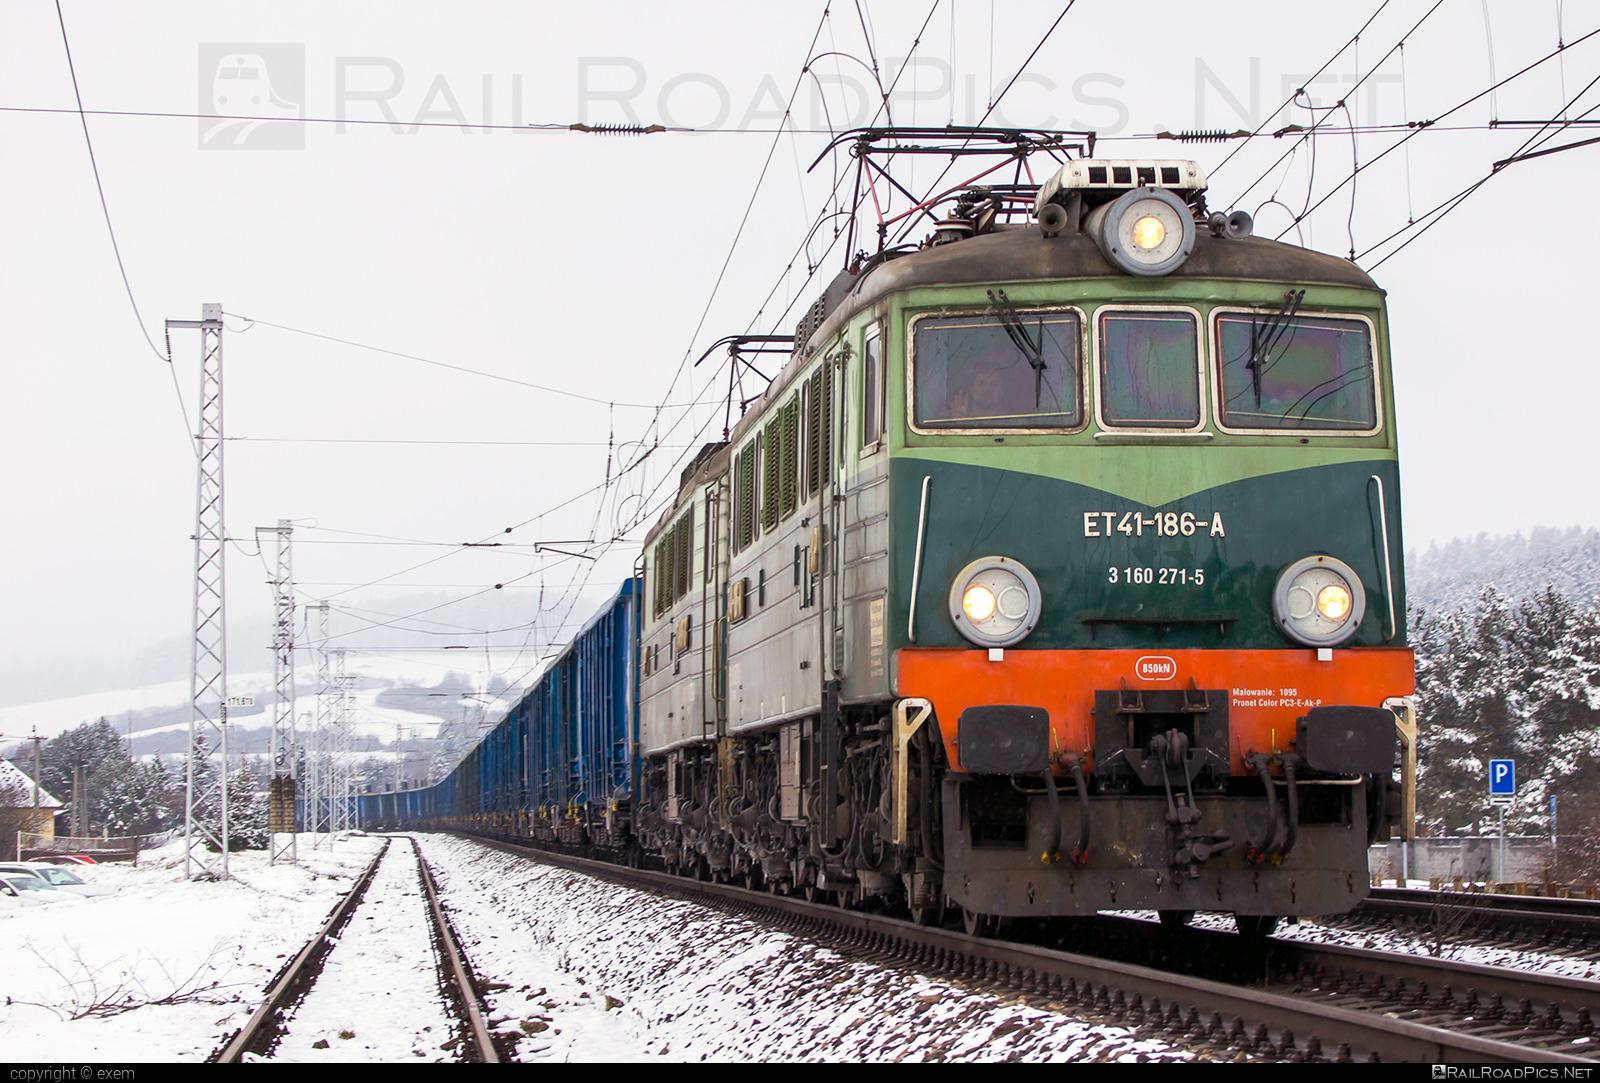 H. Cegielski - Poznań PKP Class ET41 - 3 160 271-5 operated by PKP CARGO Spólka Akcyjna #Cegielski #HCegielski #HCegielskiPoznan #et41 #pkp #pkpcargo #pkpcargospolkaakcyjna #pkpet41